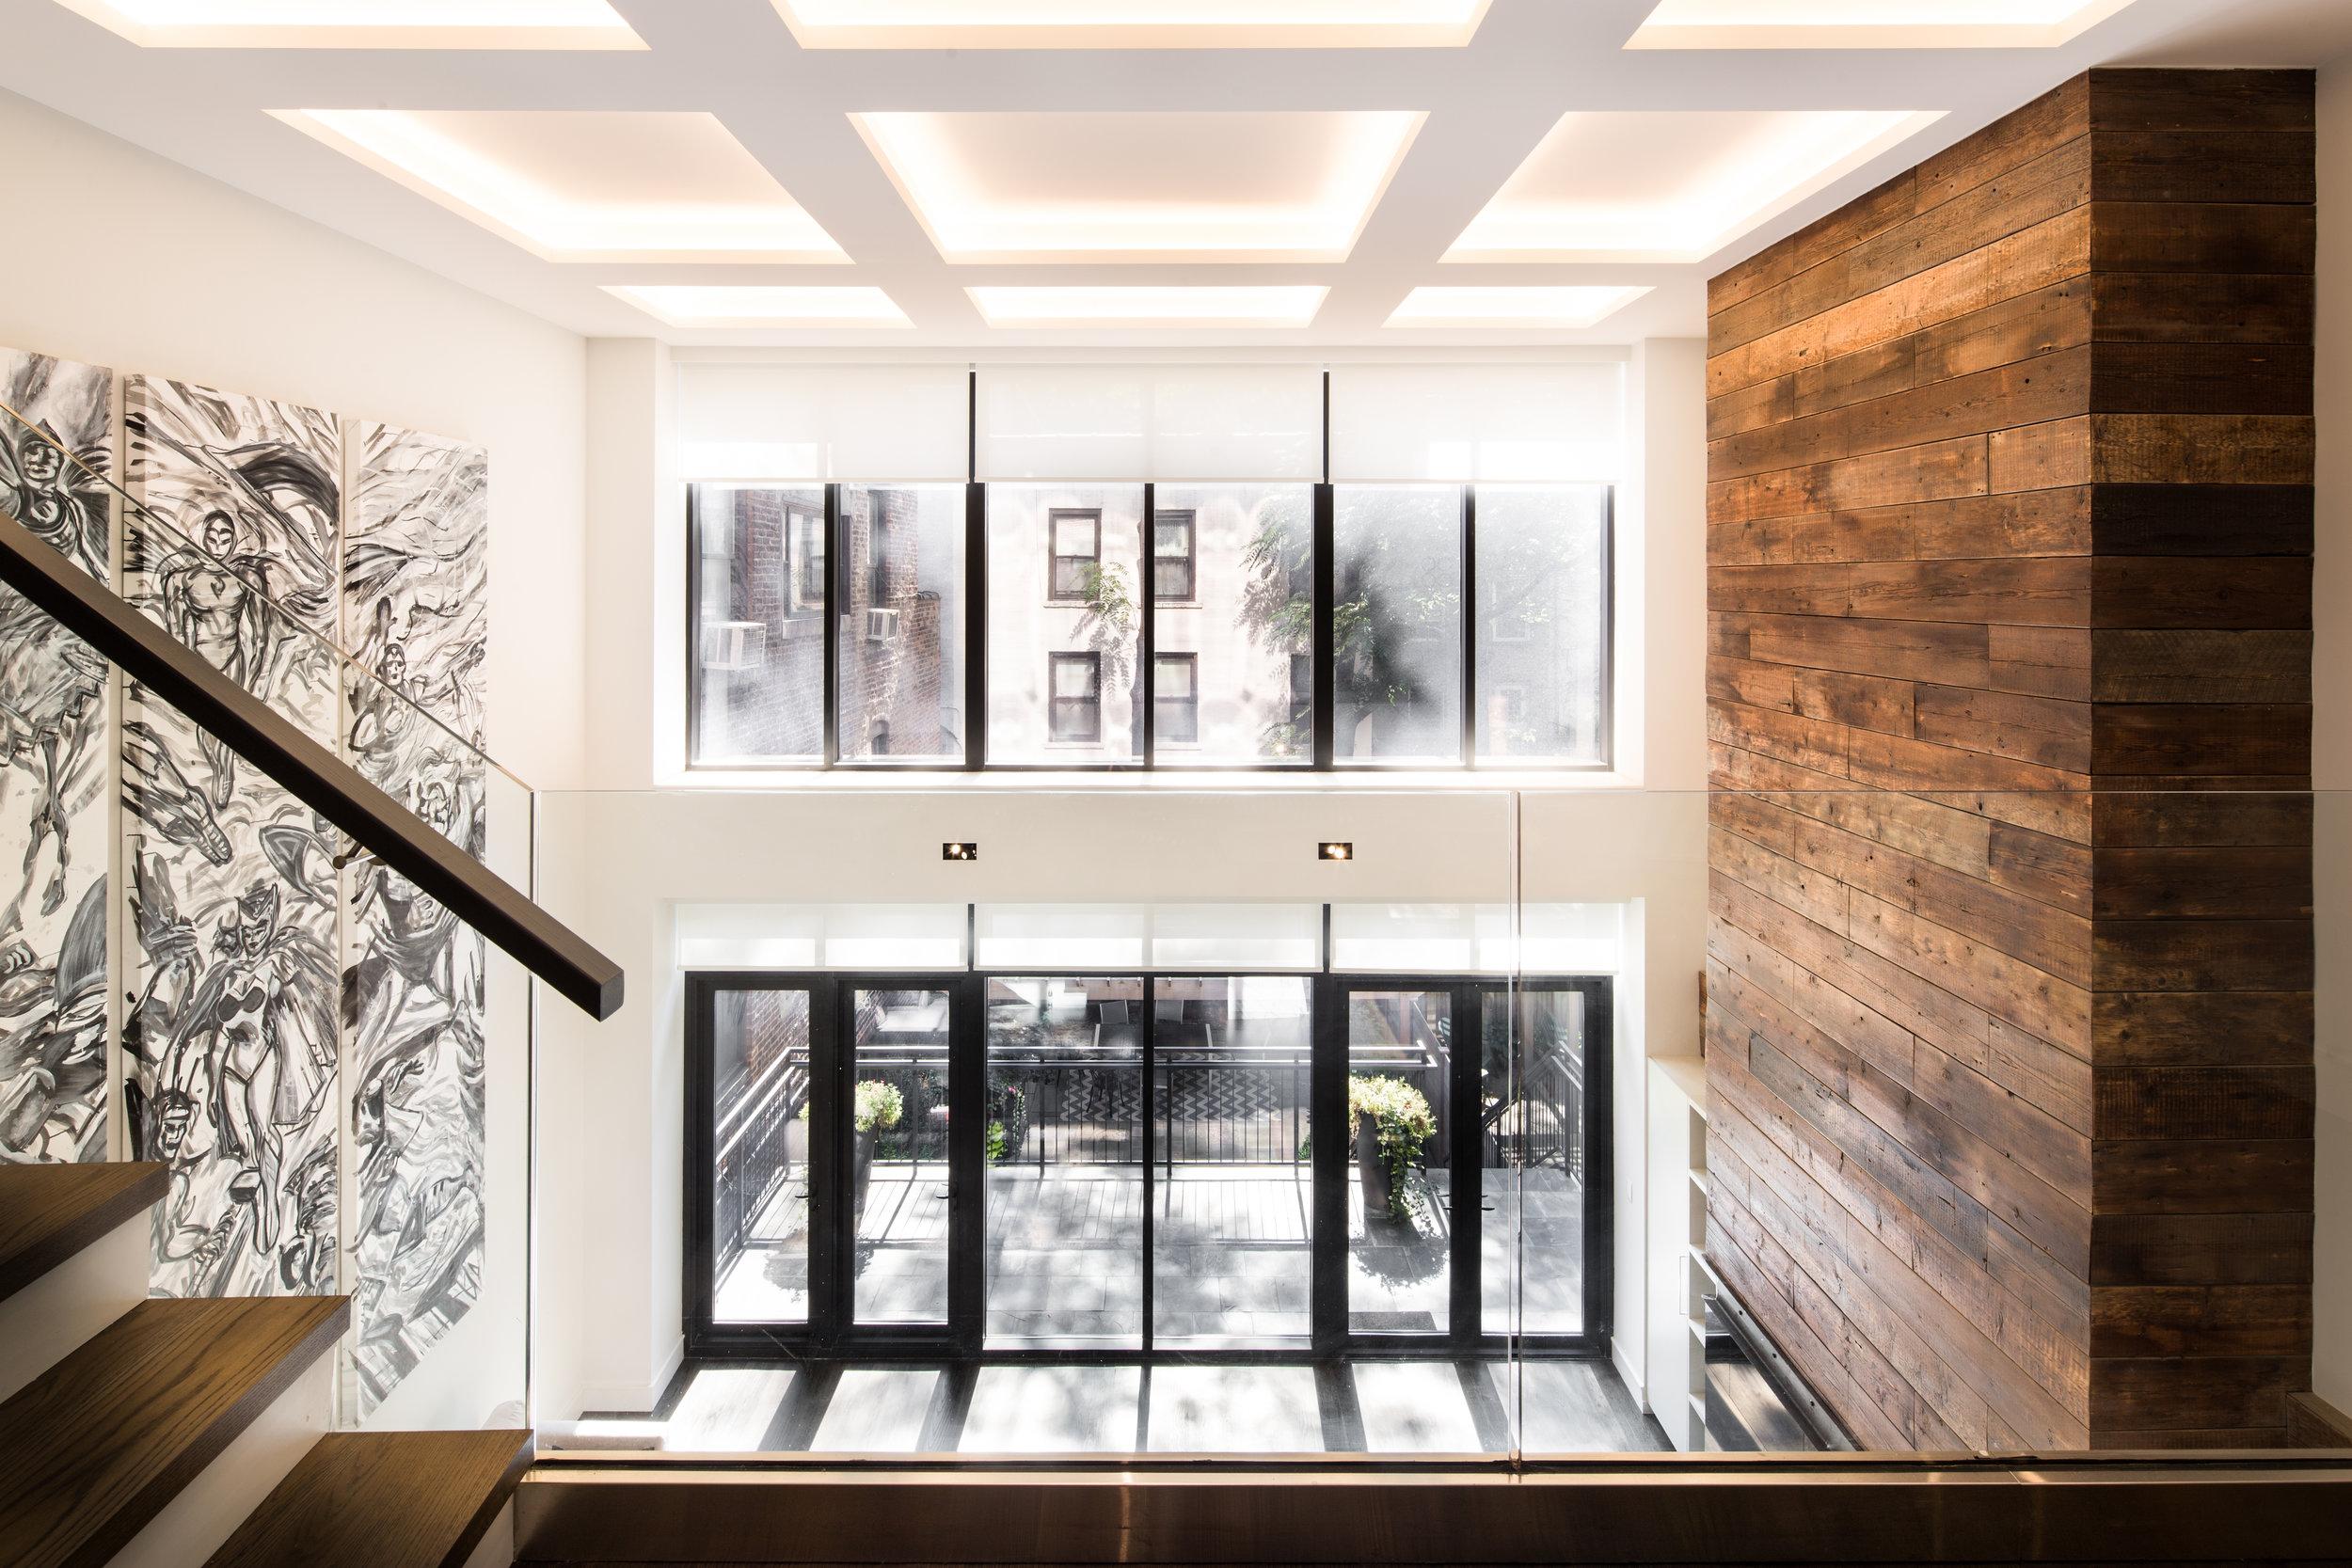 Interiors Photography - Window View